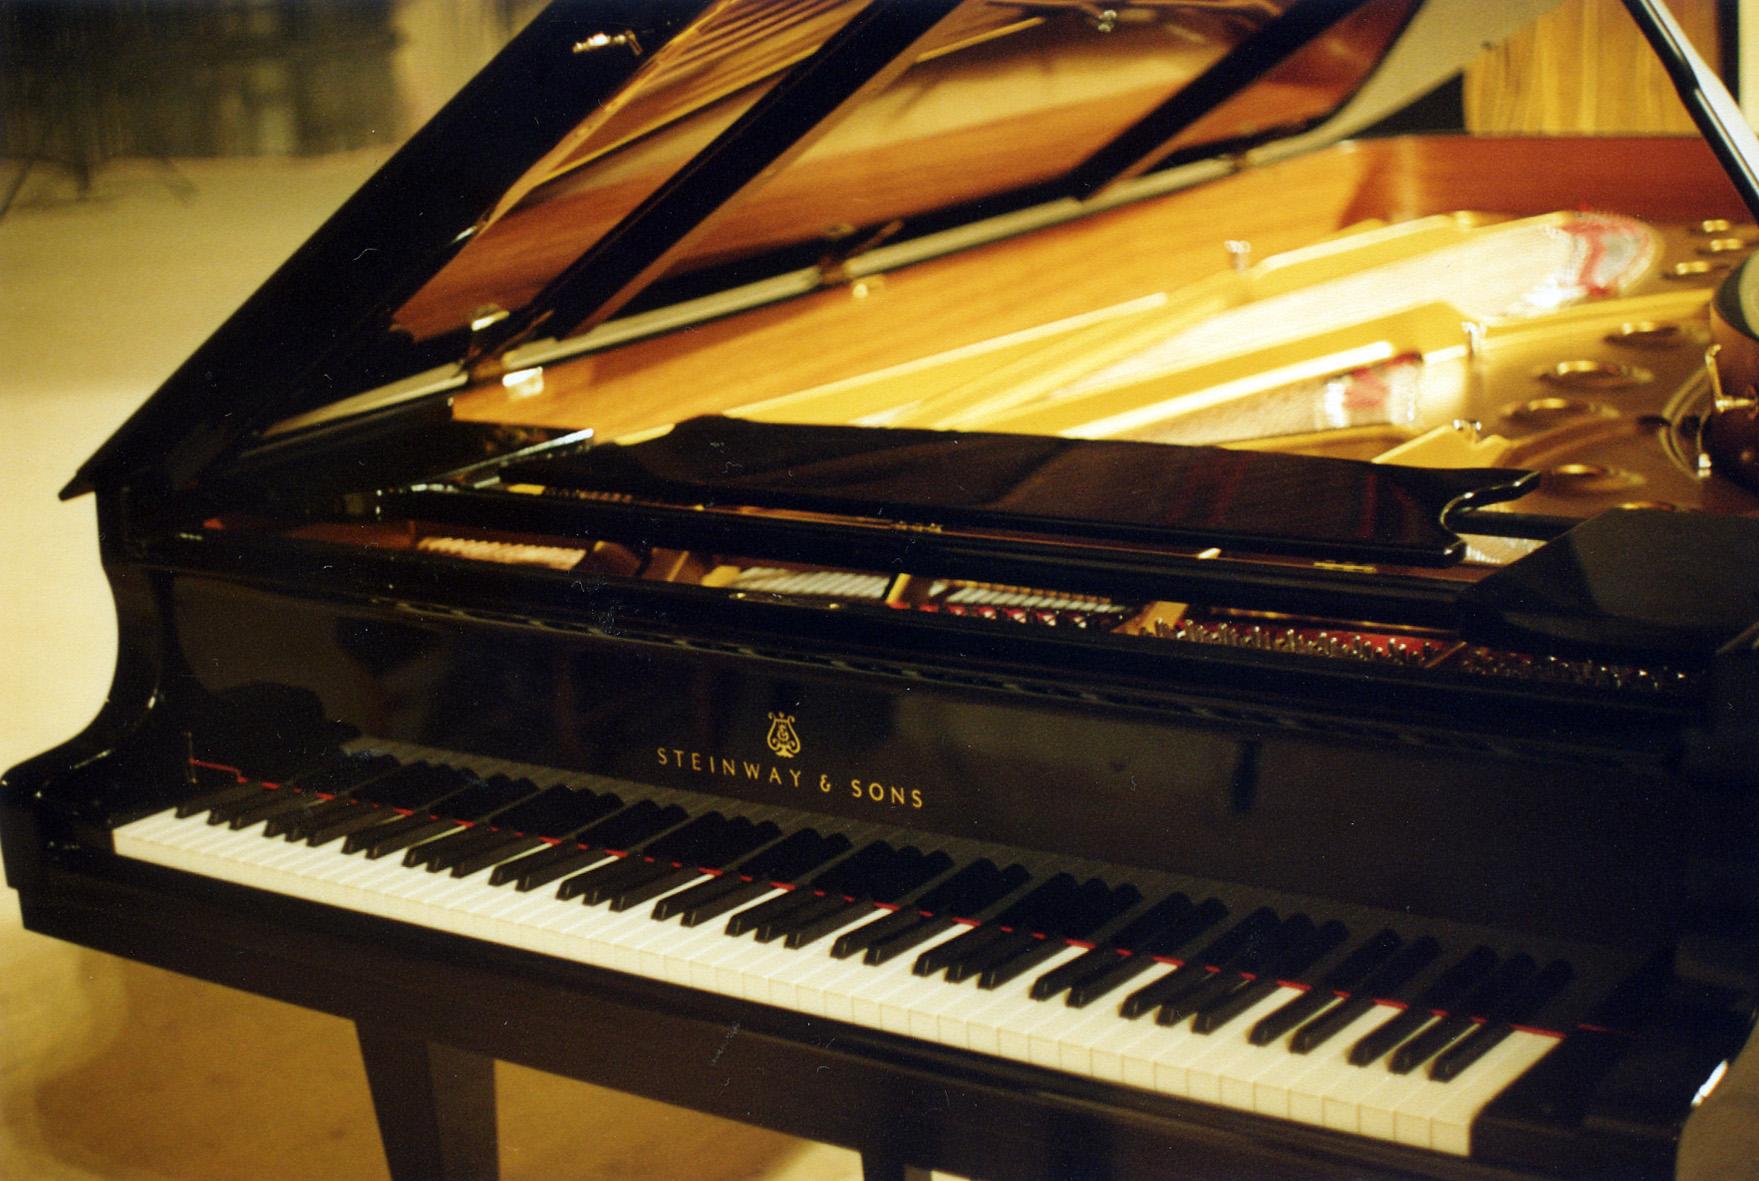 картинка концерт фортепиано офис проекта